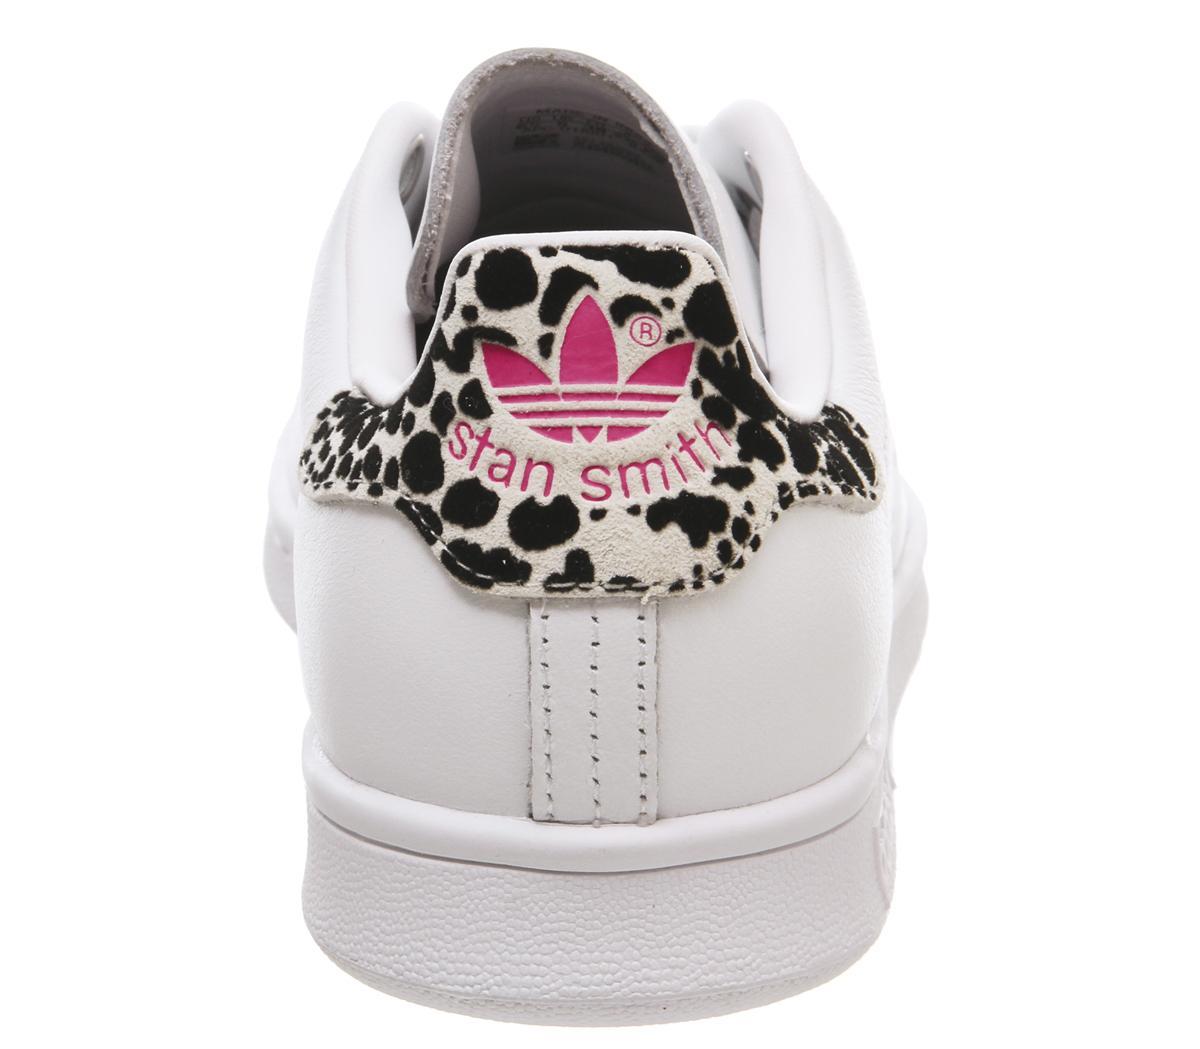 acheter populaire 1518e d80ec adidas Stan Smith Animal Print Pink